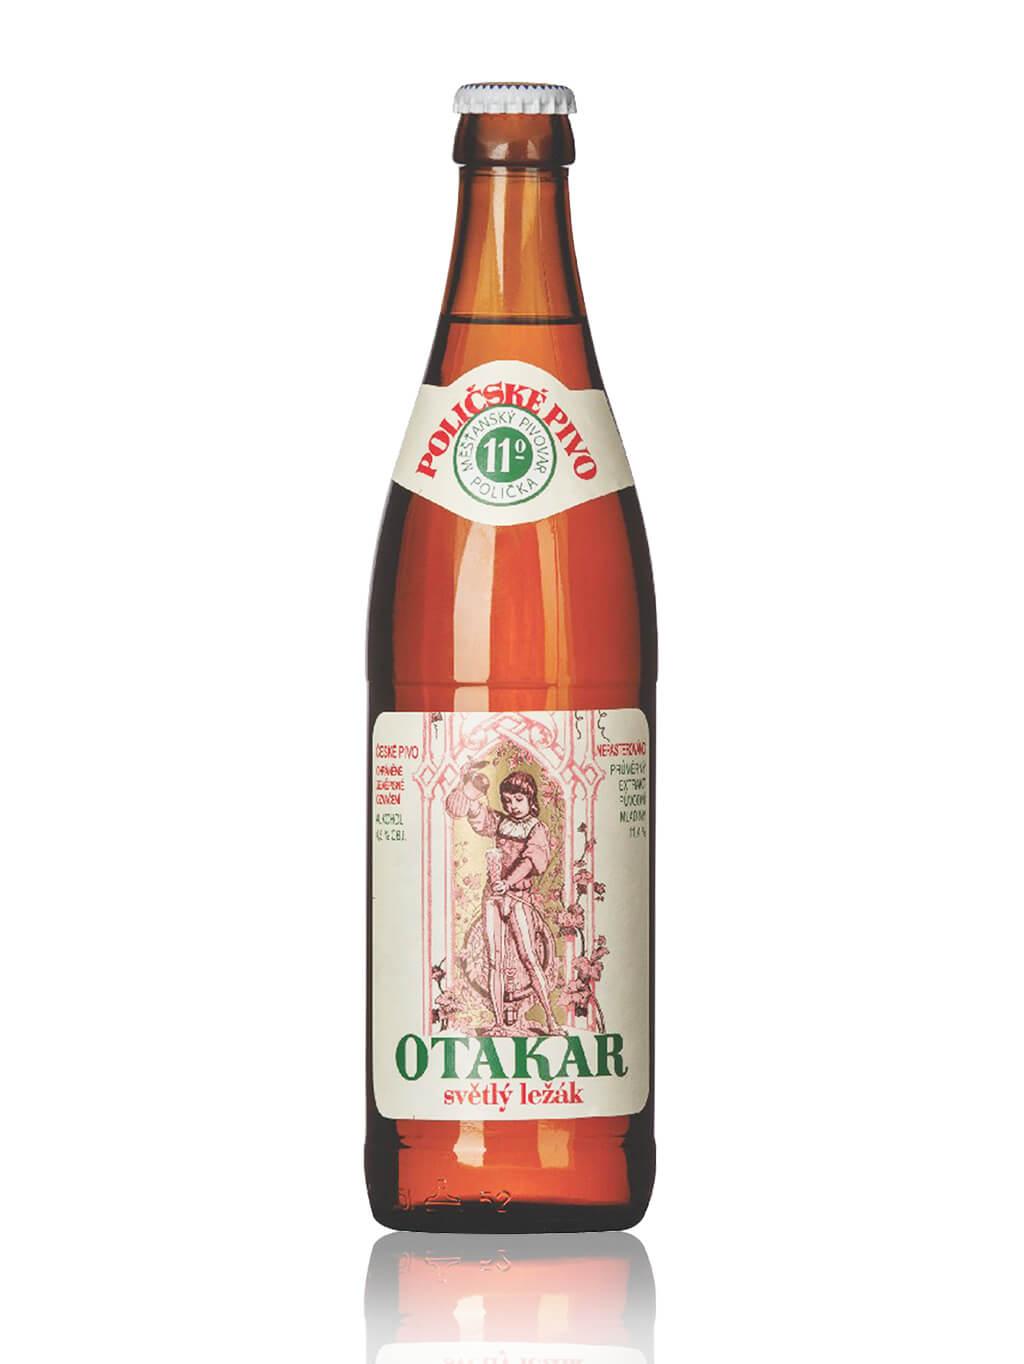 Polička-Otakar-světlý-ležák